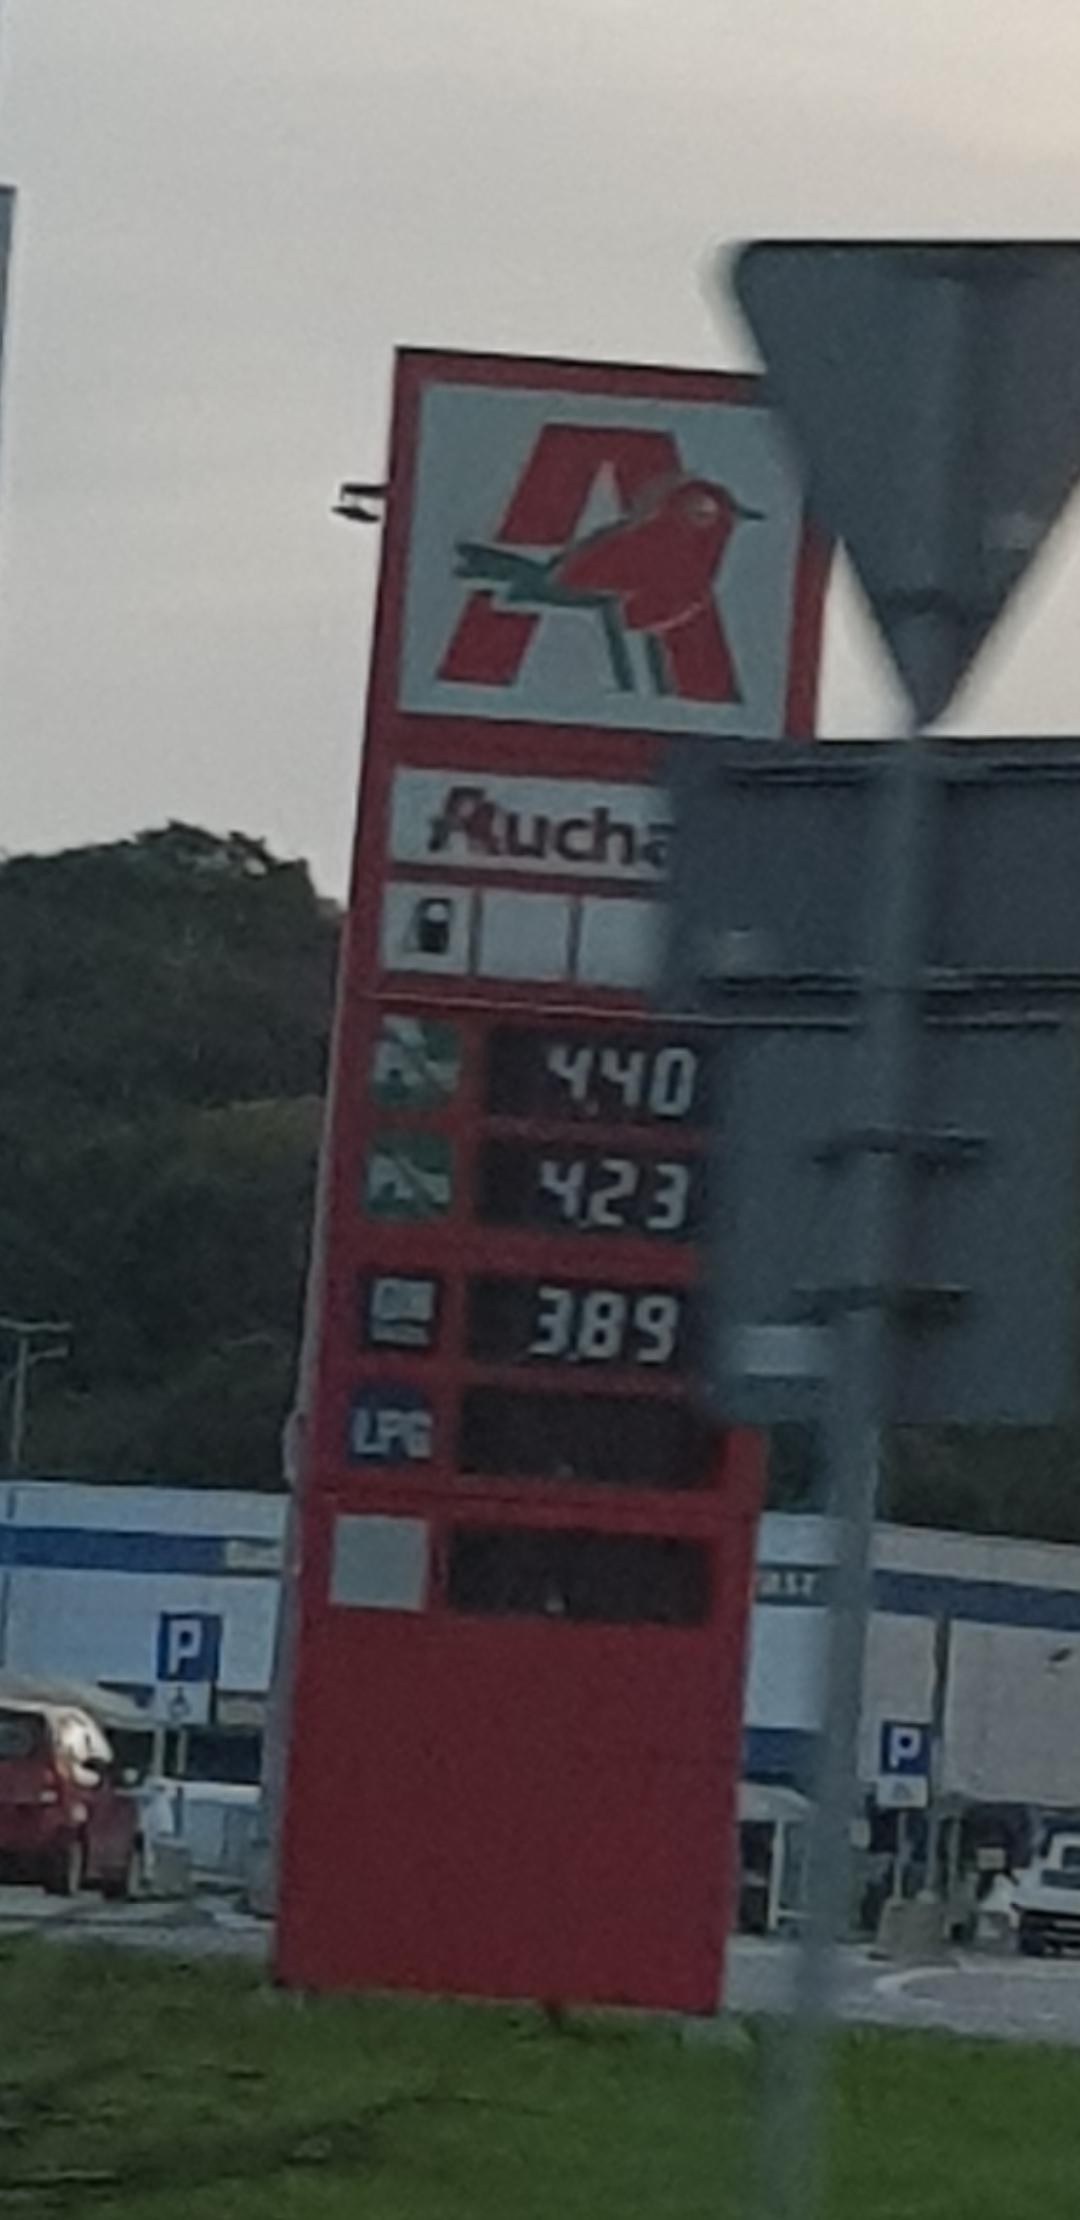 Diesel po 3.89 zł za litr - Auchan Racibórz